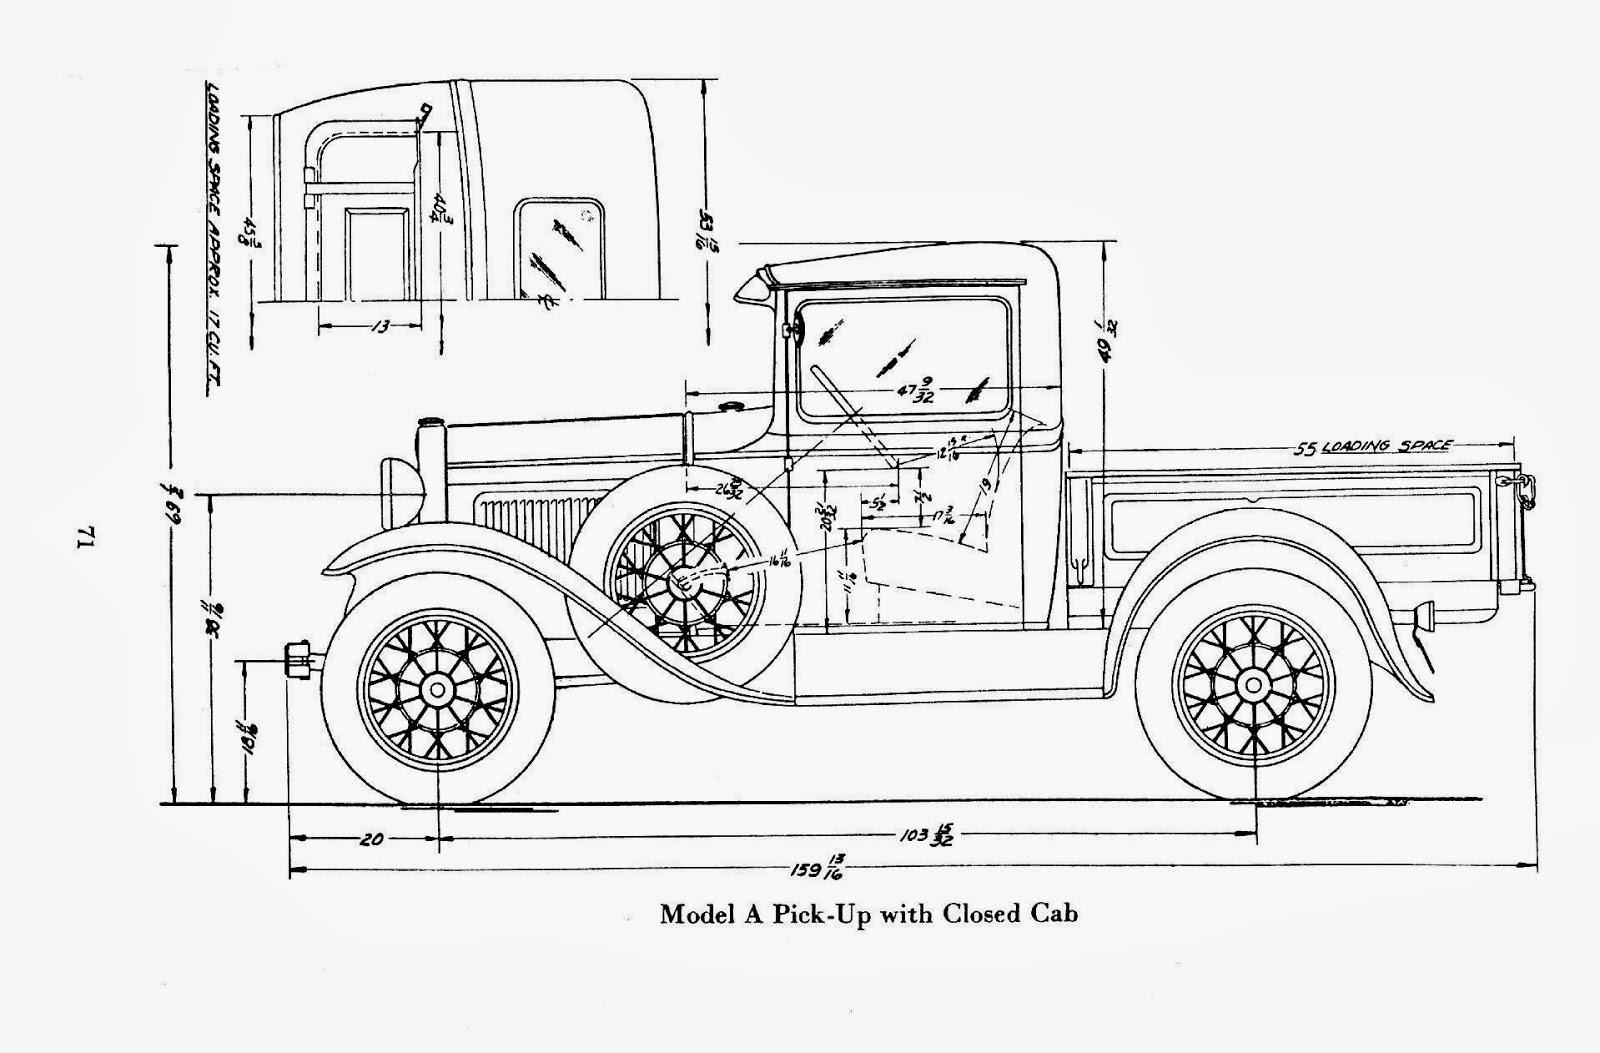 1929 model a pick up bedradings schema